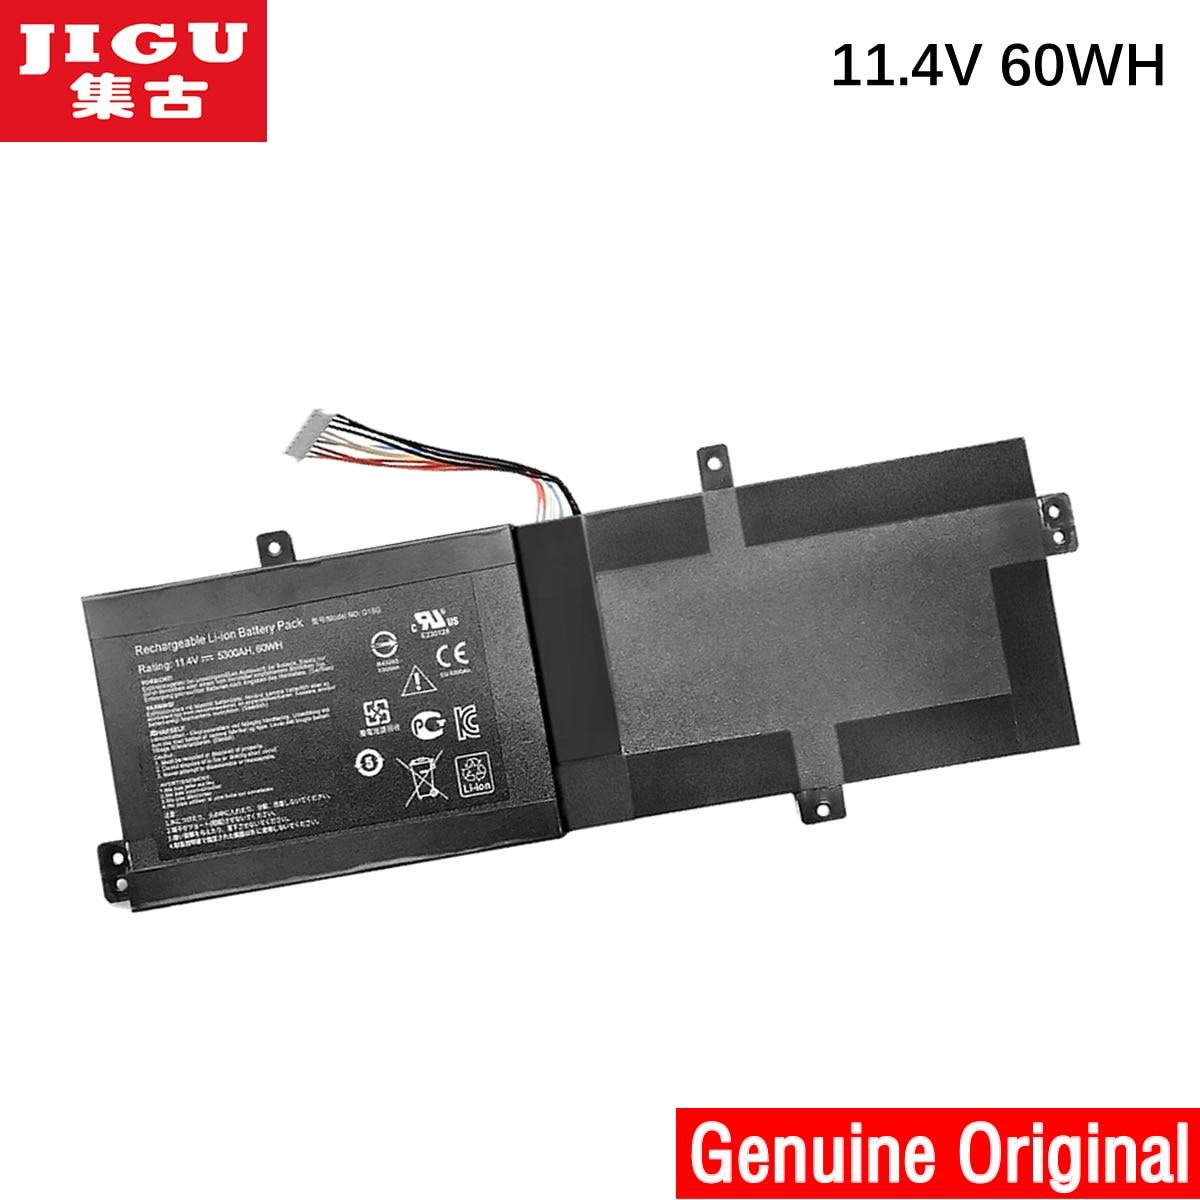 JIGU Original Laptop Battery G15G For THUNDEROBOT For targa 911 T5TB For SabrePro 15 For SABREPRO 15-W8 11.4V 60WH